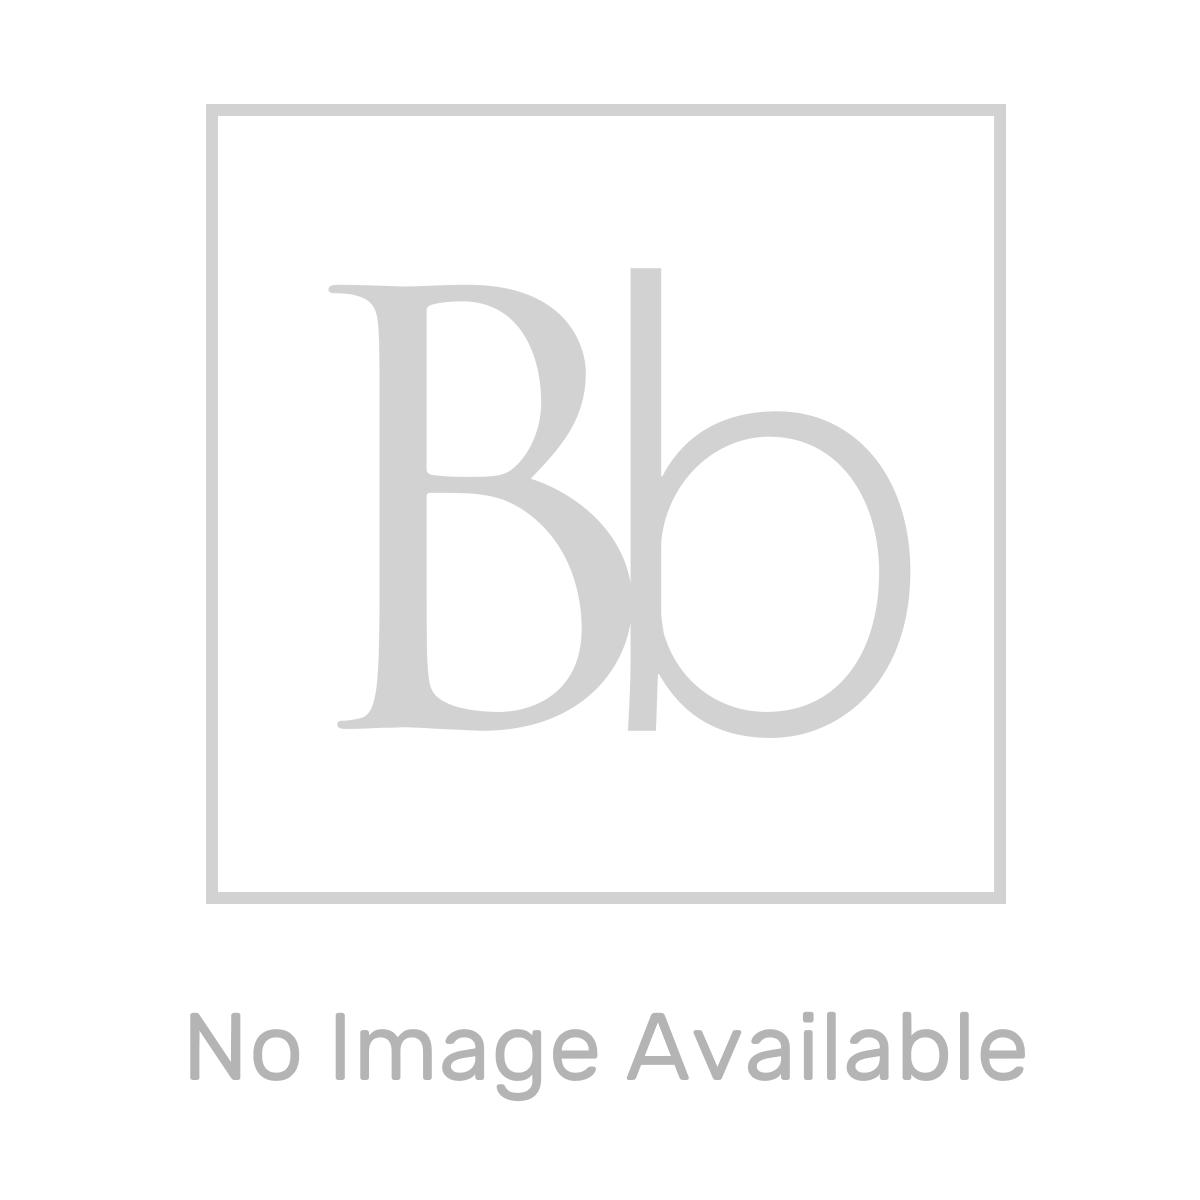 RAK Concealed Automatic Urinal Cistern 13.5L Measurements